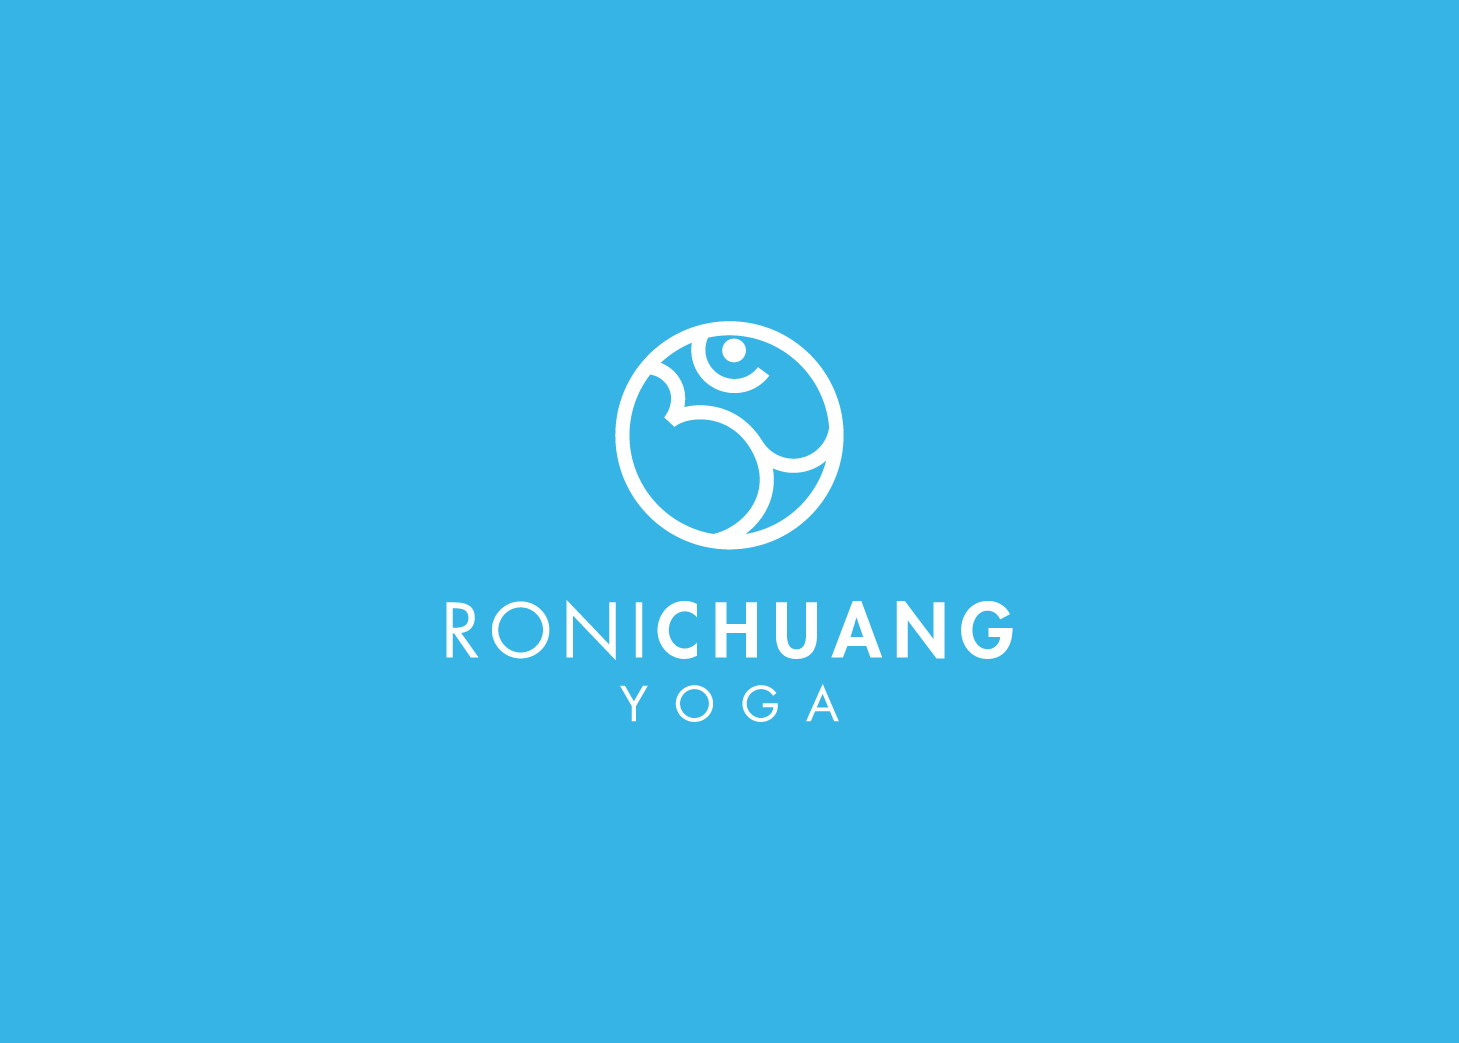 diseño-yoga-logotipo